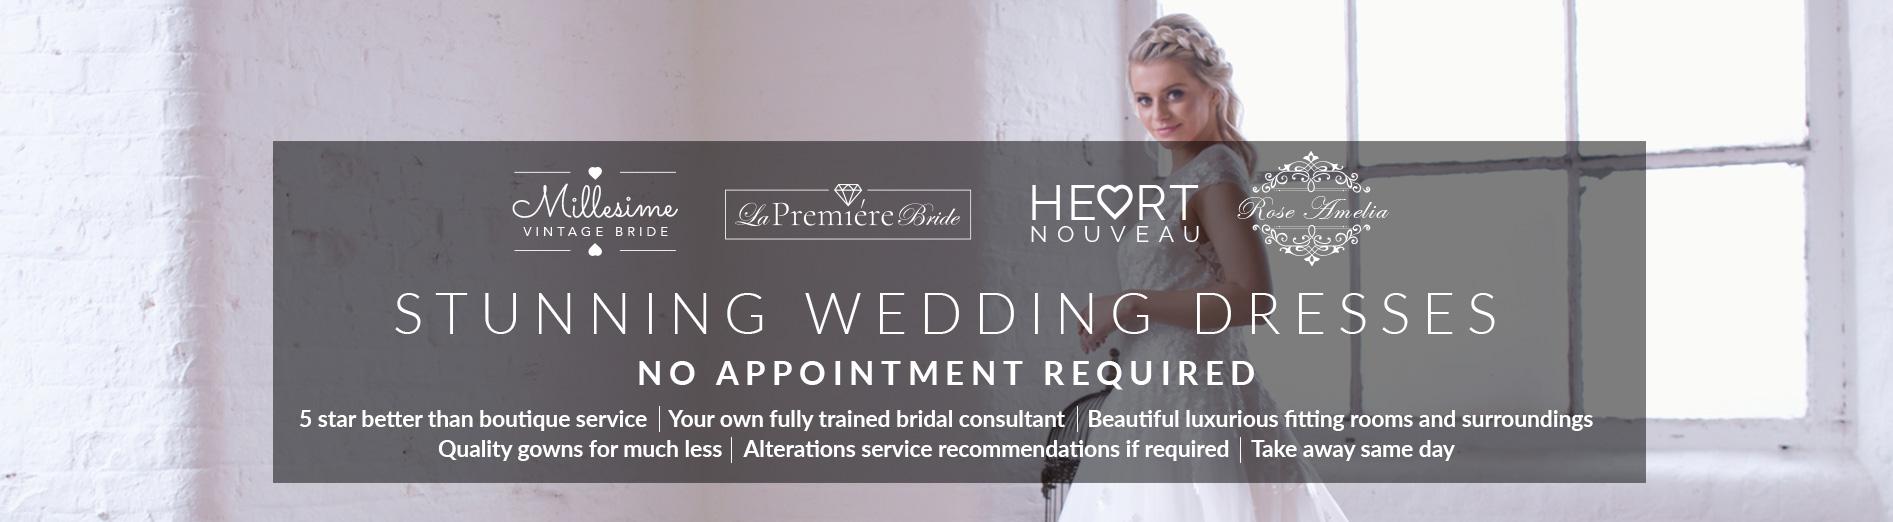 Wedding-dresses-1